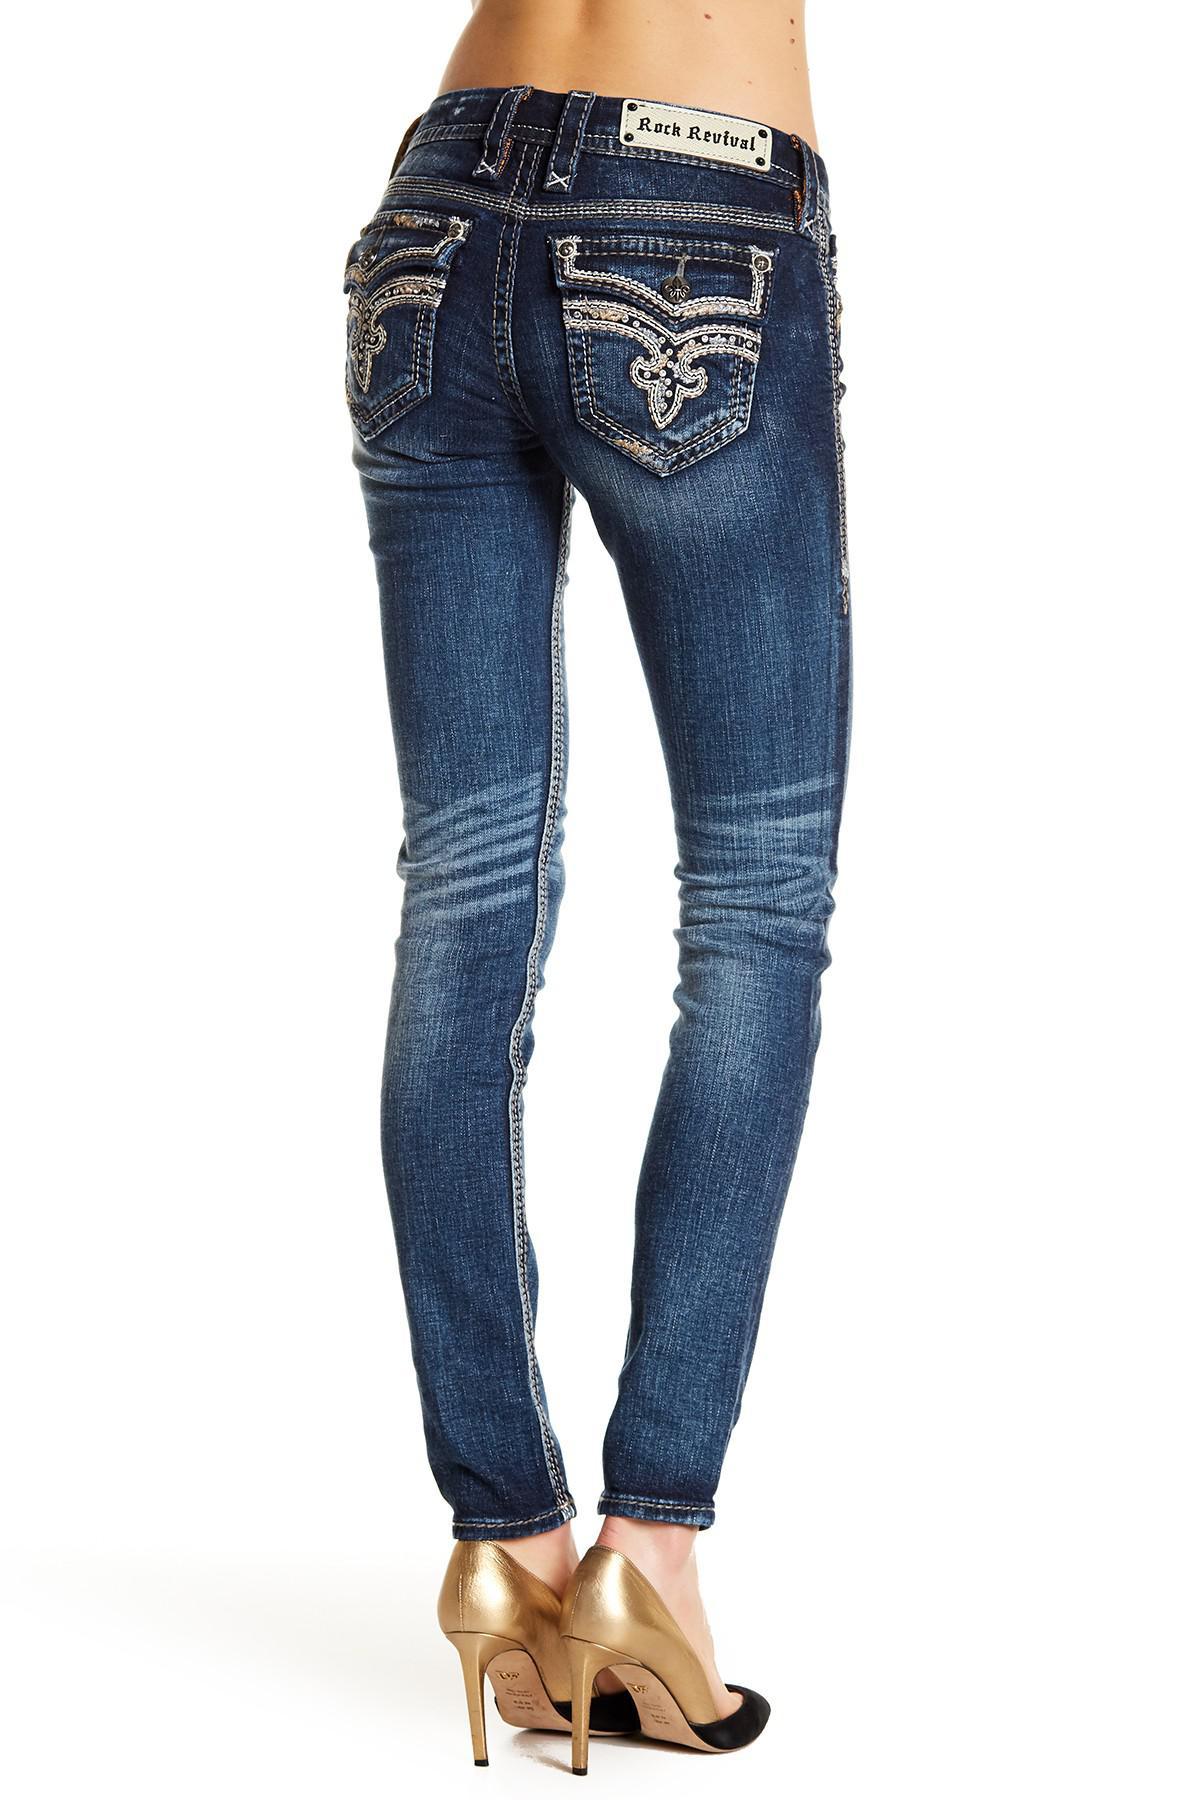 Lyst - Rock Revival Xia Skinny Jeans in Blue